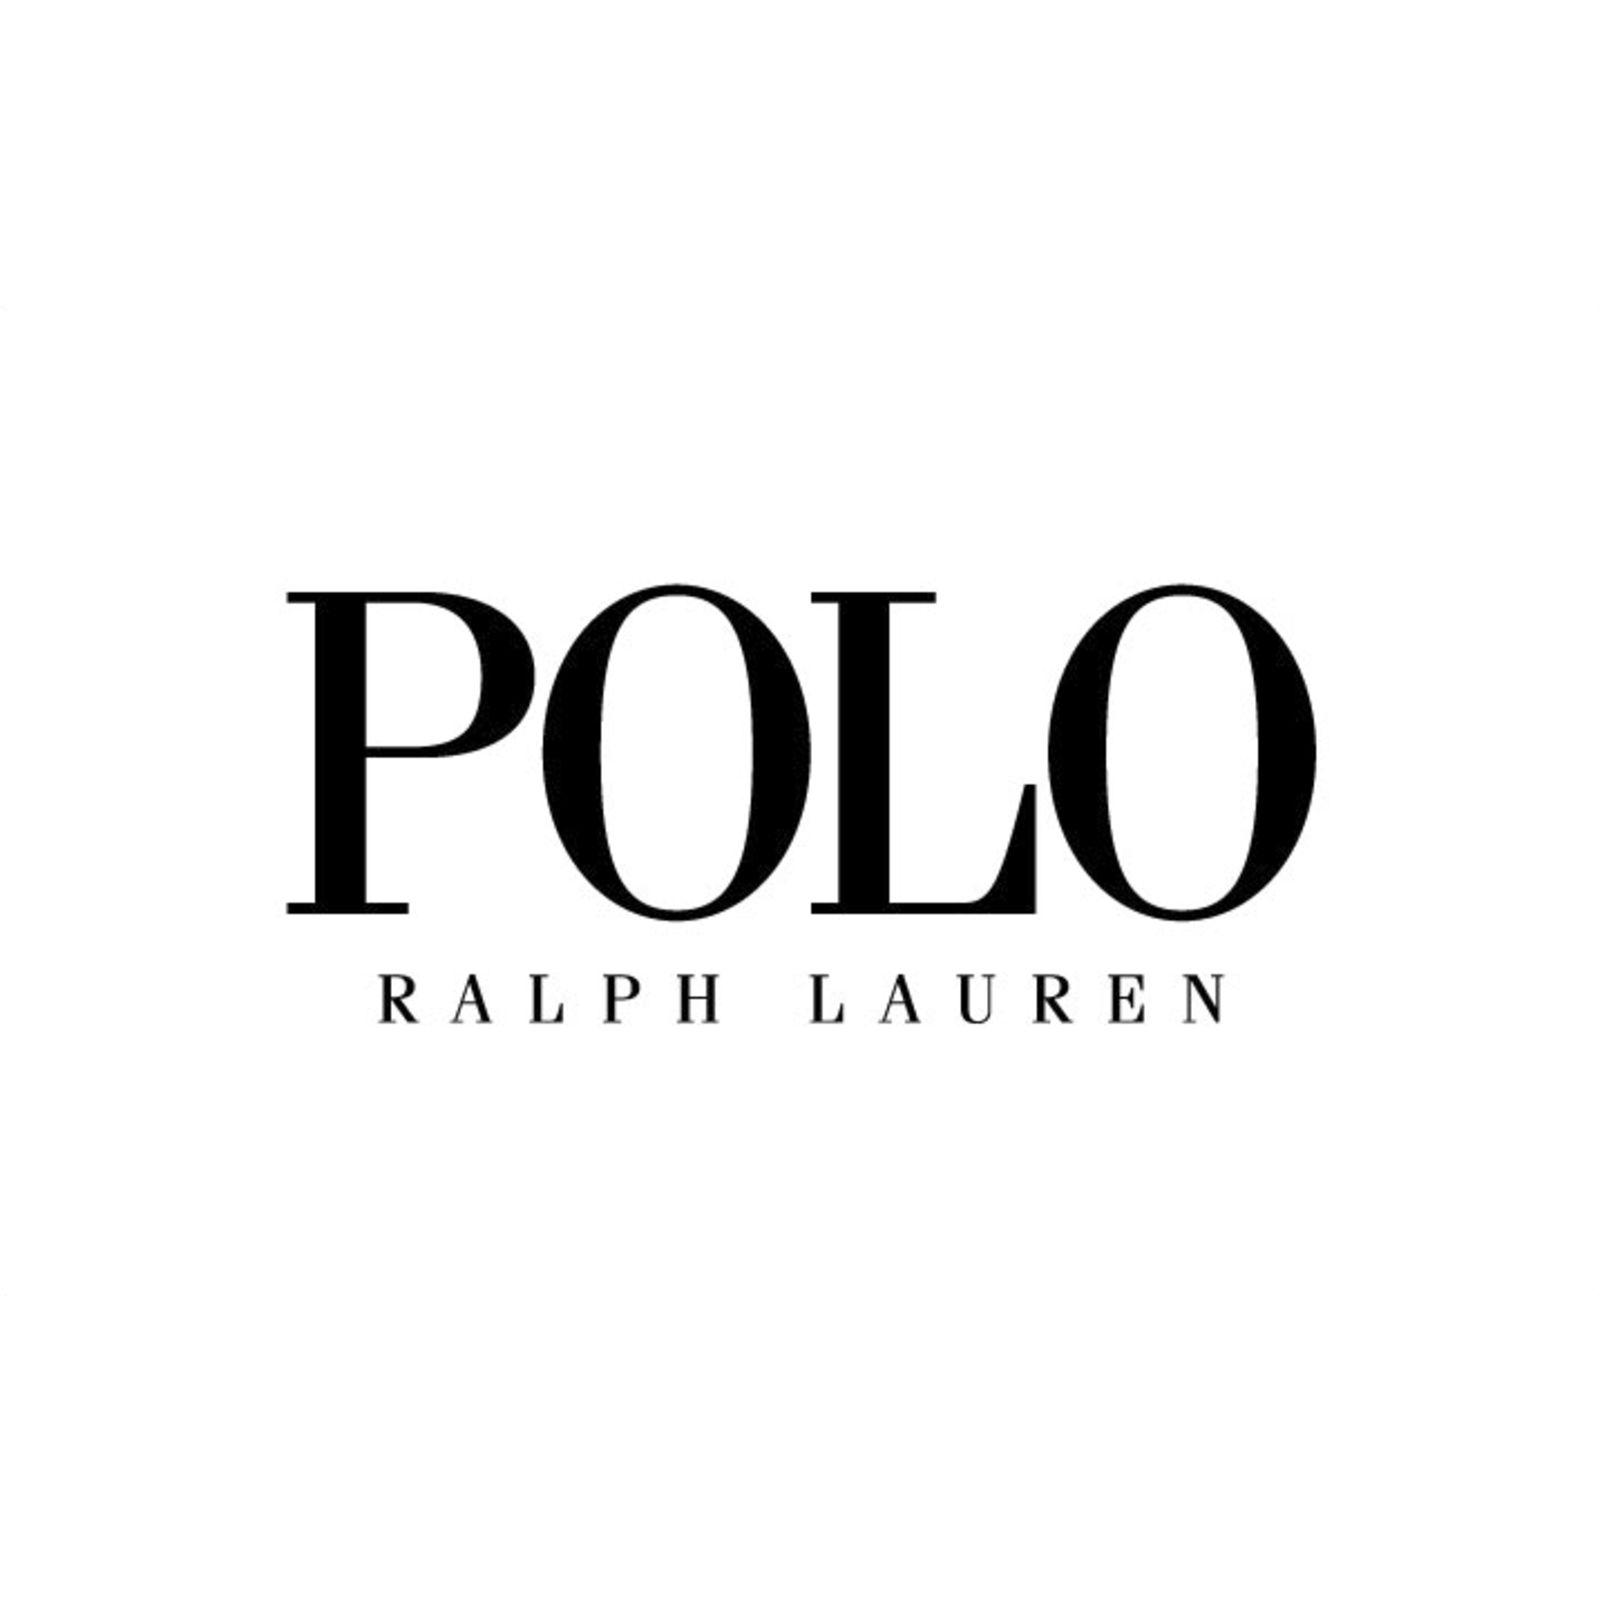 POLO RALPH LAUREN (Image 1)